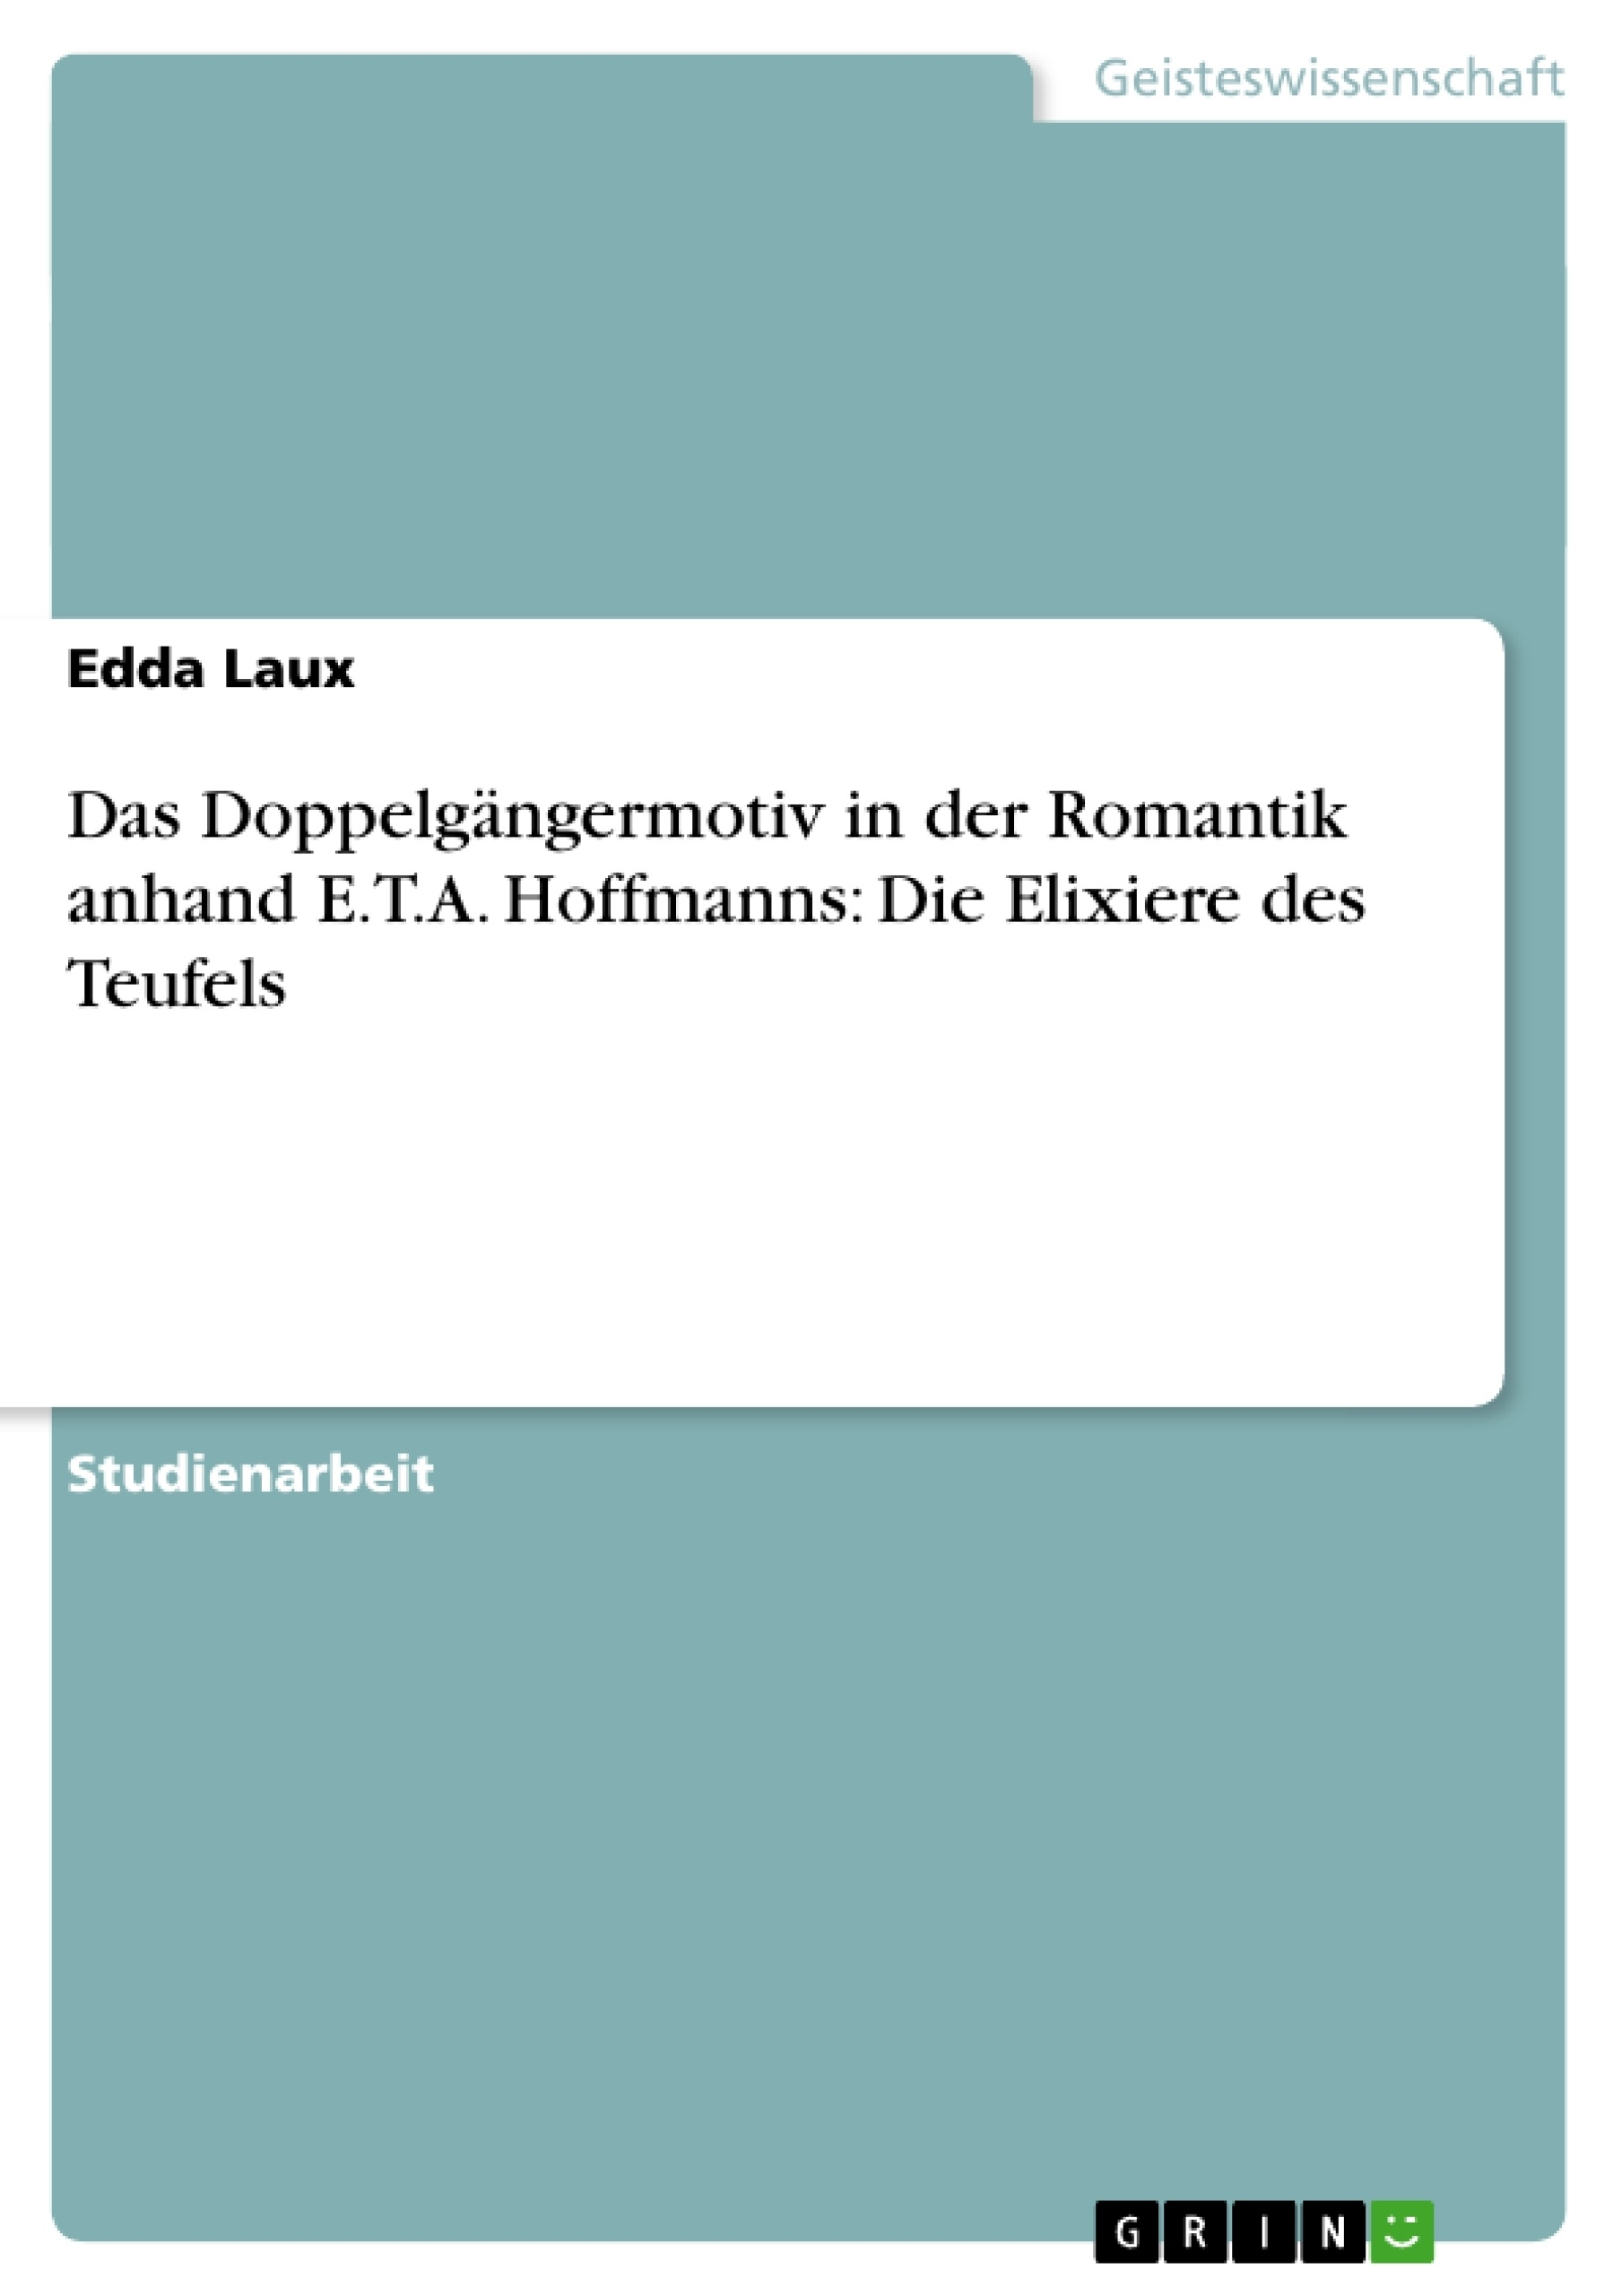 Titel: Das Doppelgängermotiv in der Romantik anhand E.T.A. Hoffmanns: Die Elixiere des Teufels